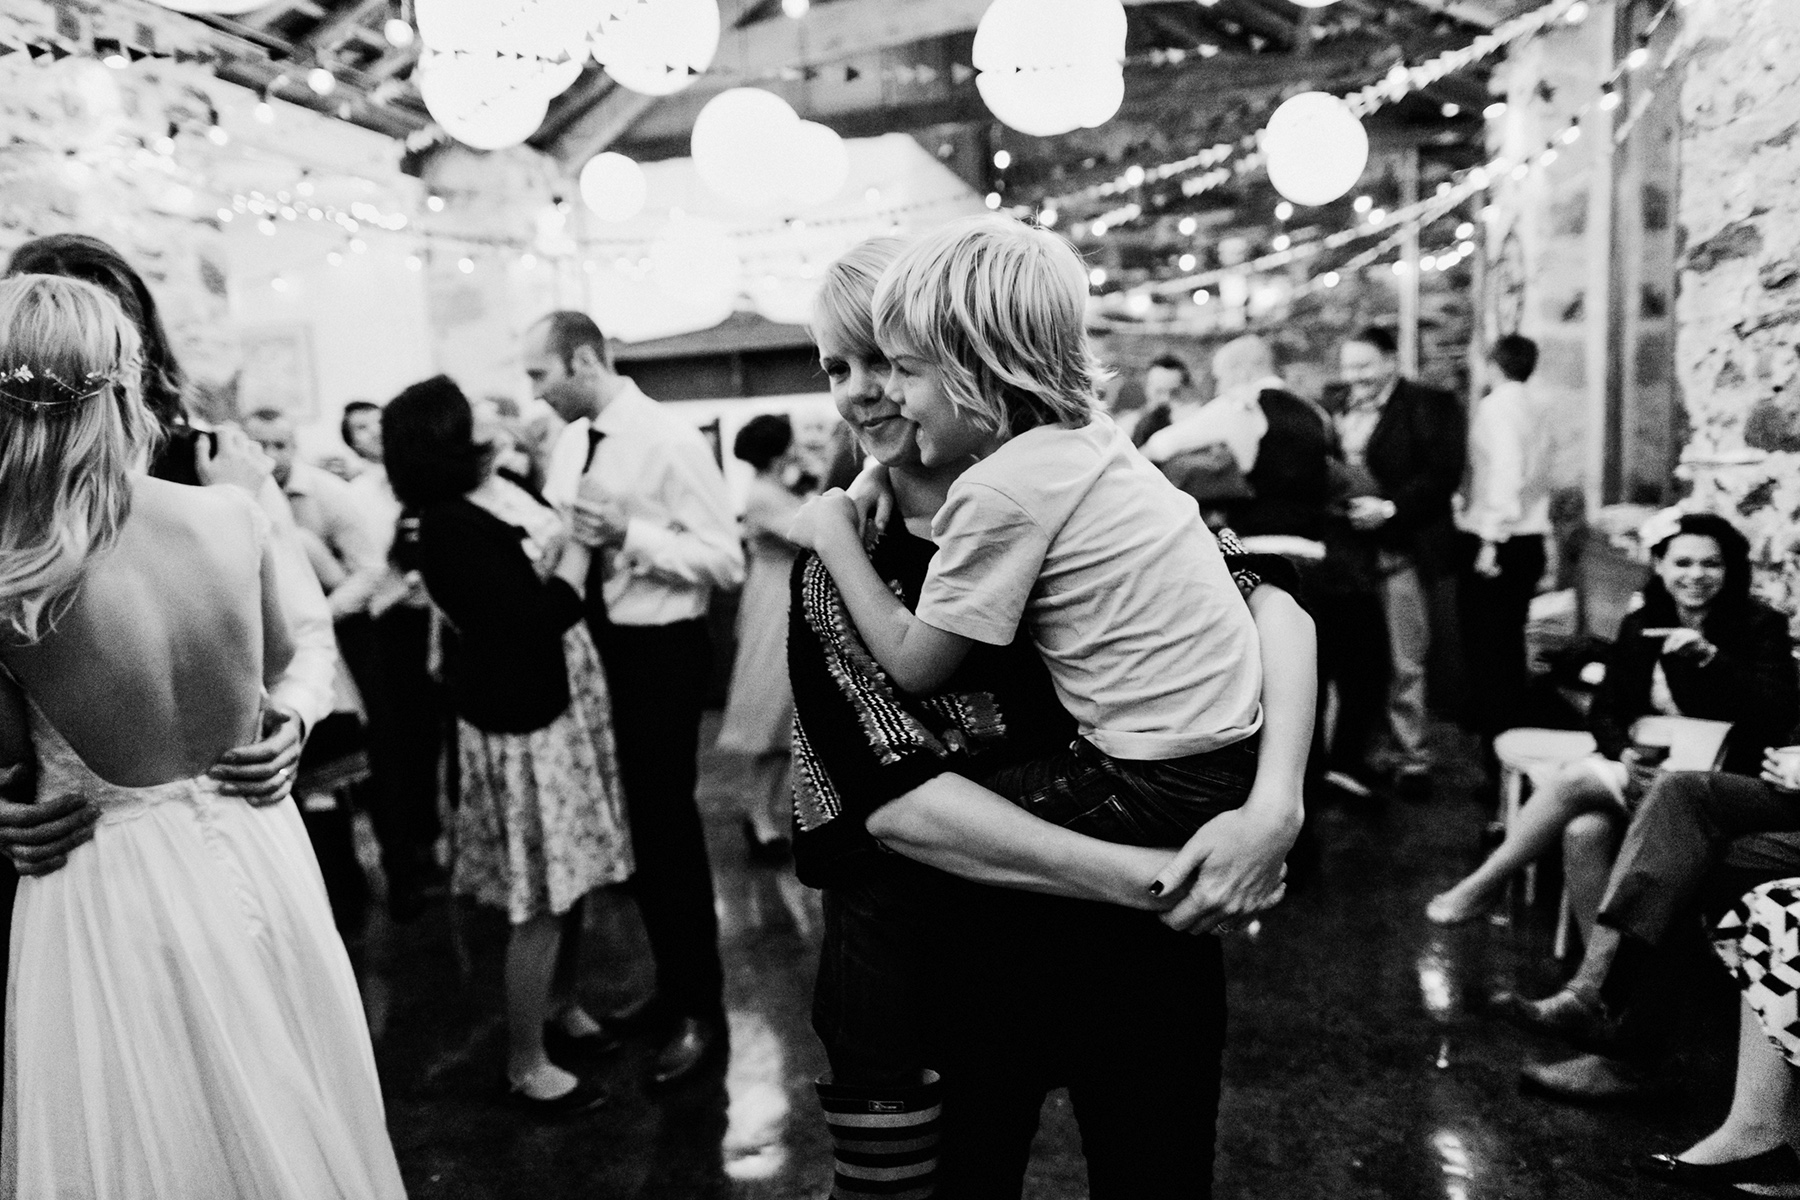 Snowdonia-Wales-Wedding-Photos-0404.jpg